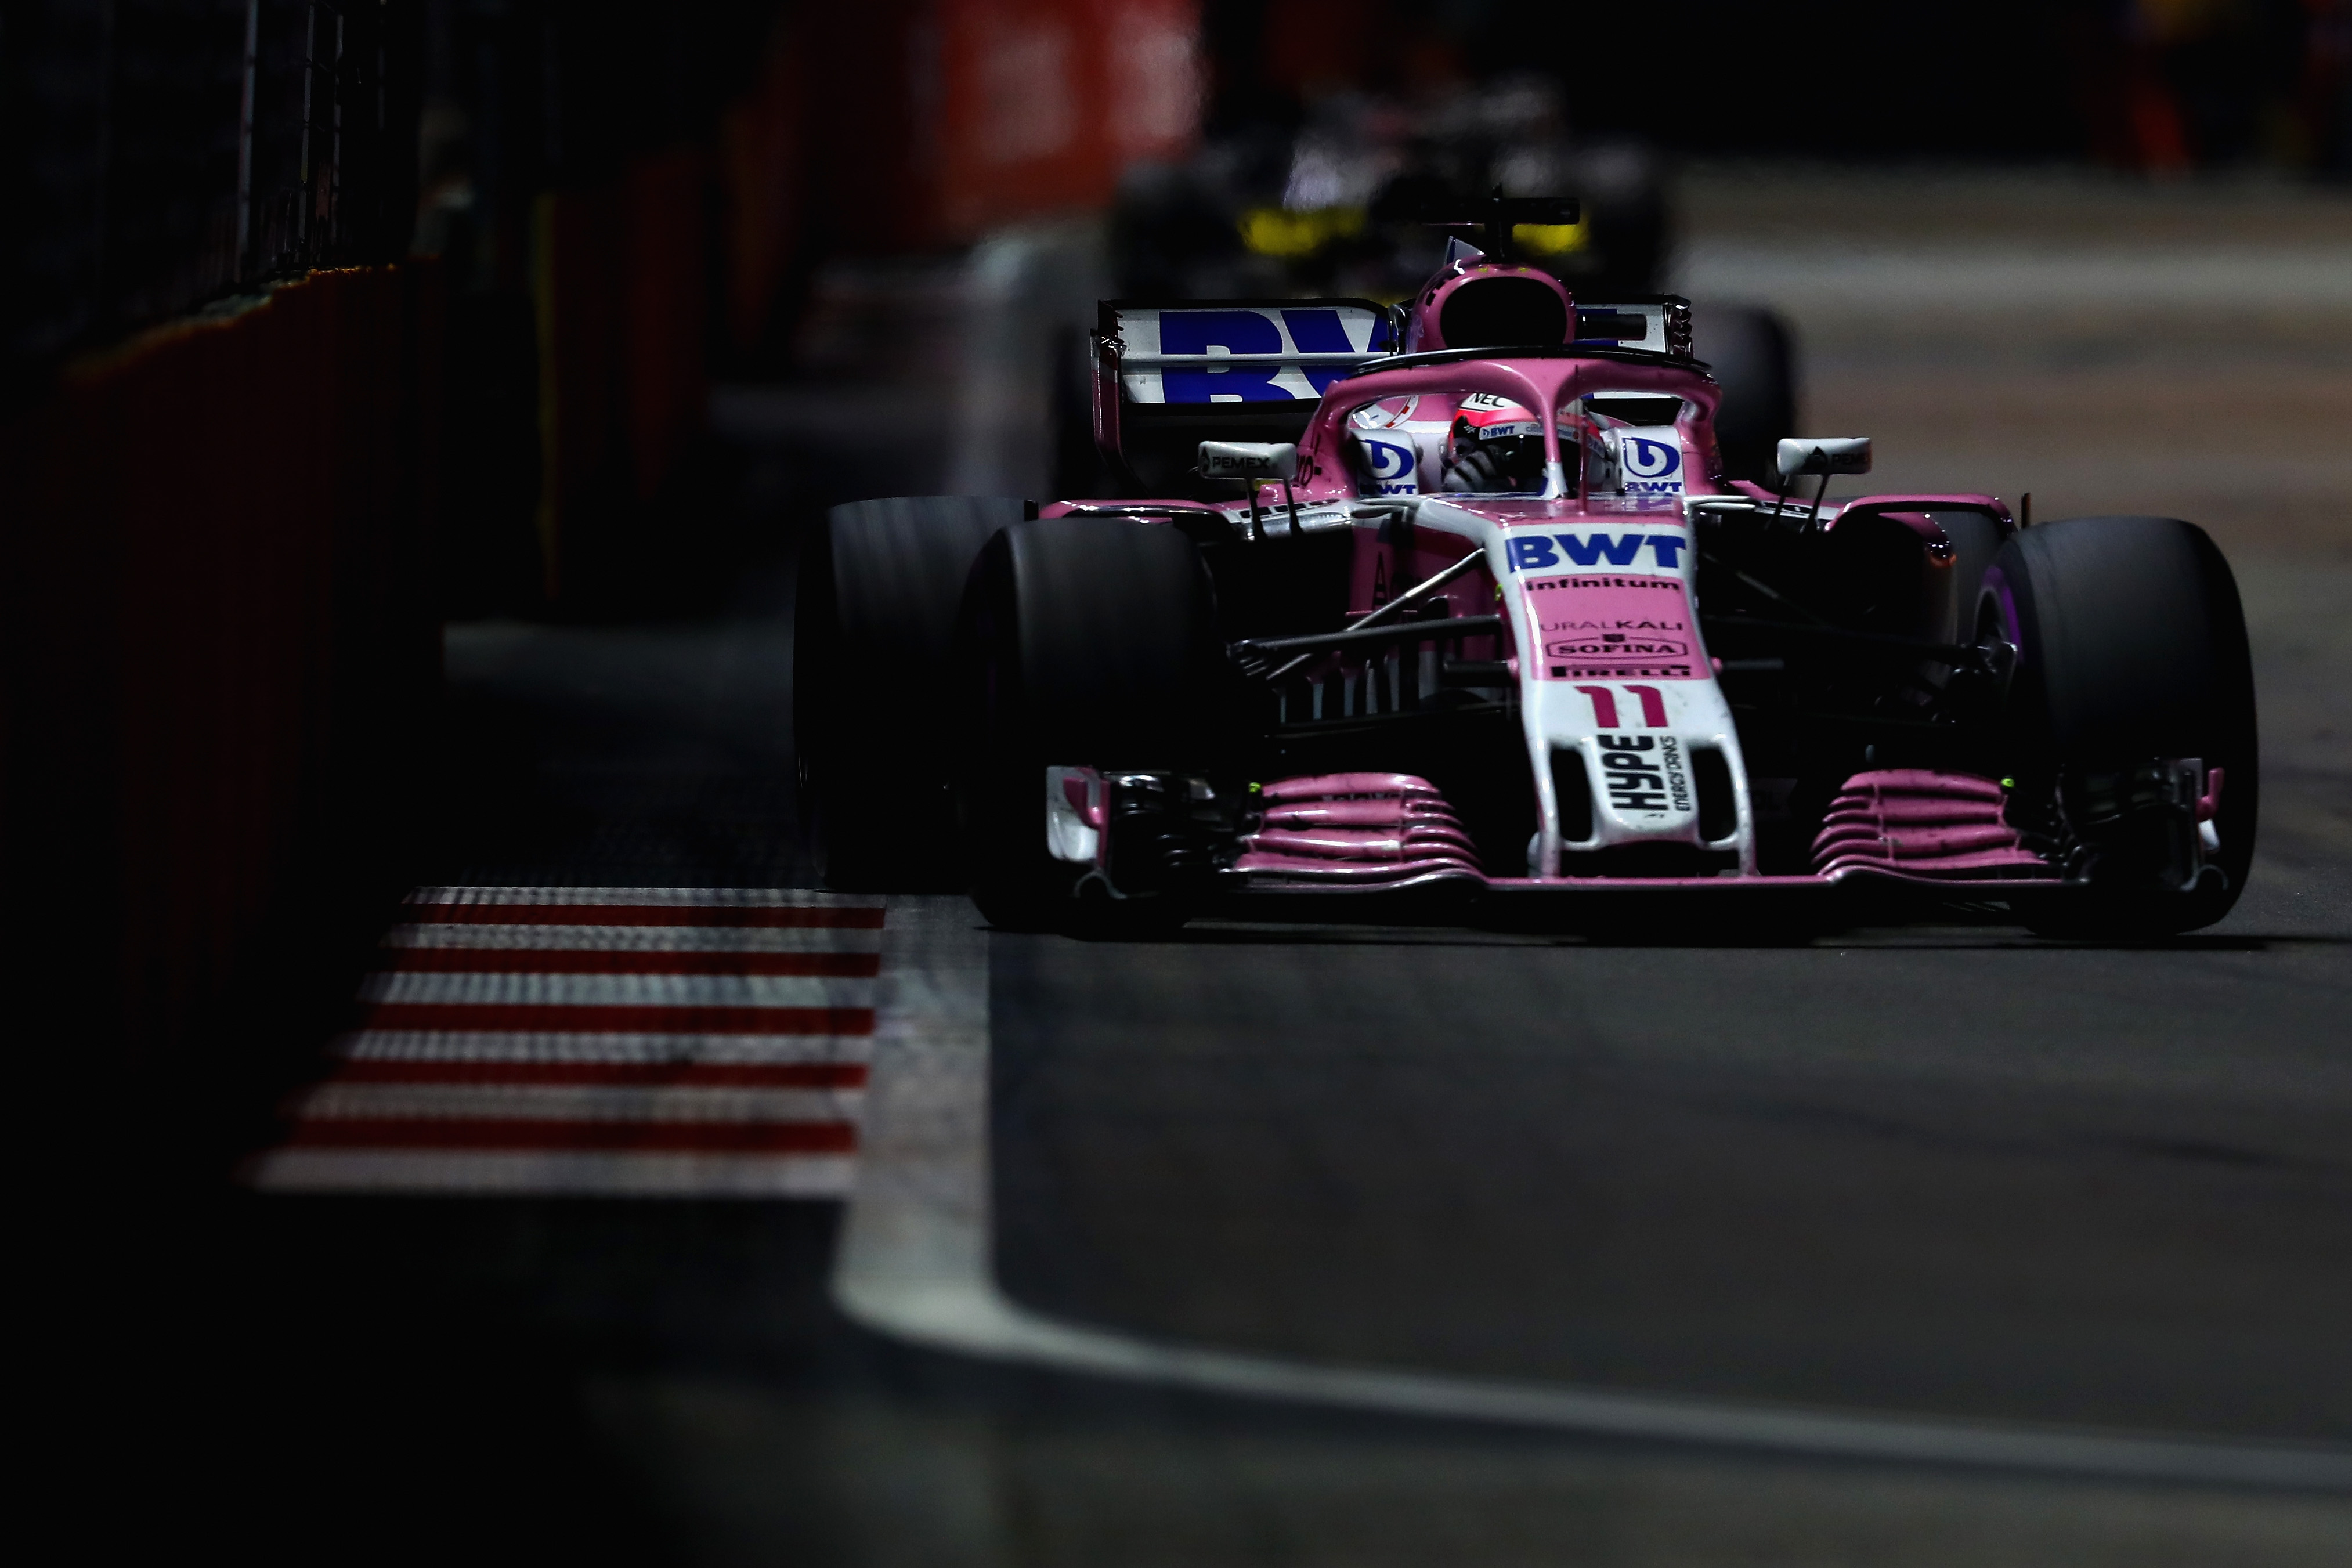 Fórmula 1, Femenil, Mujeres, Pilotos